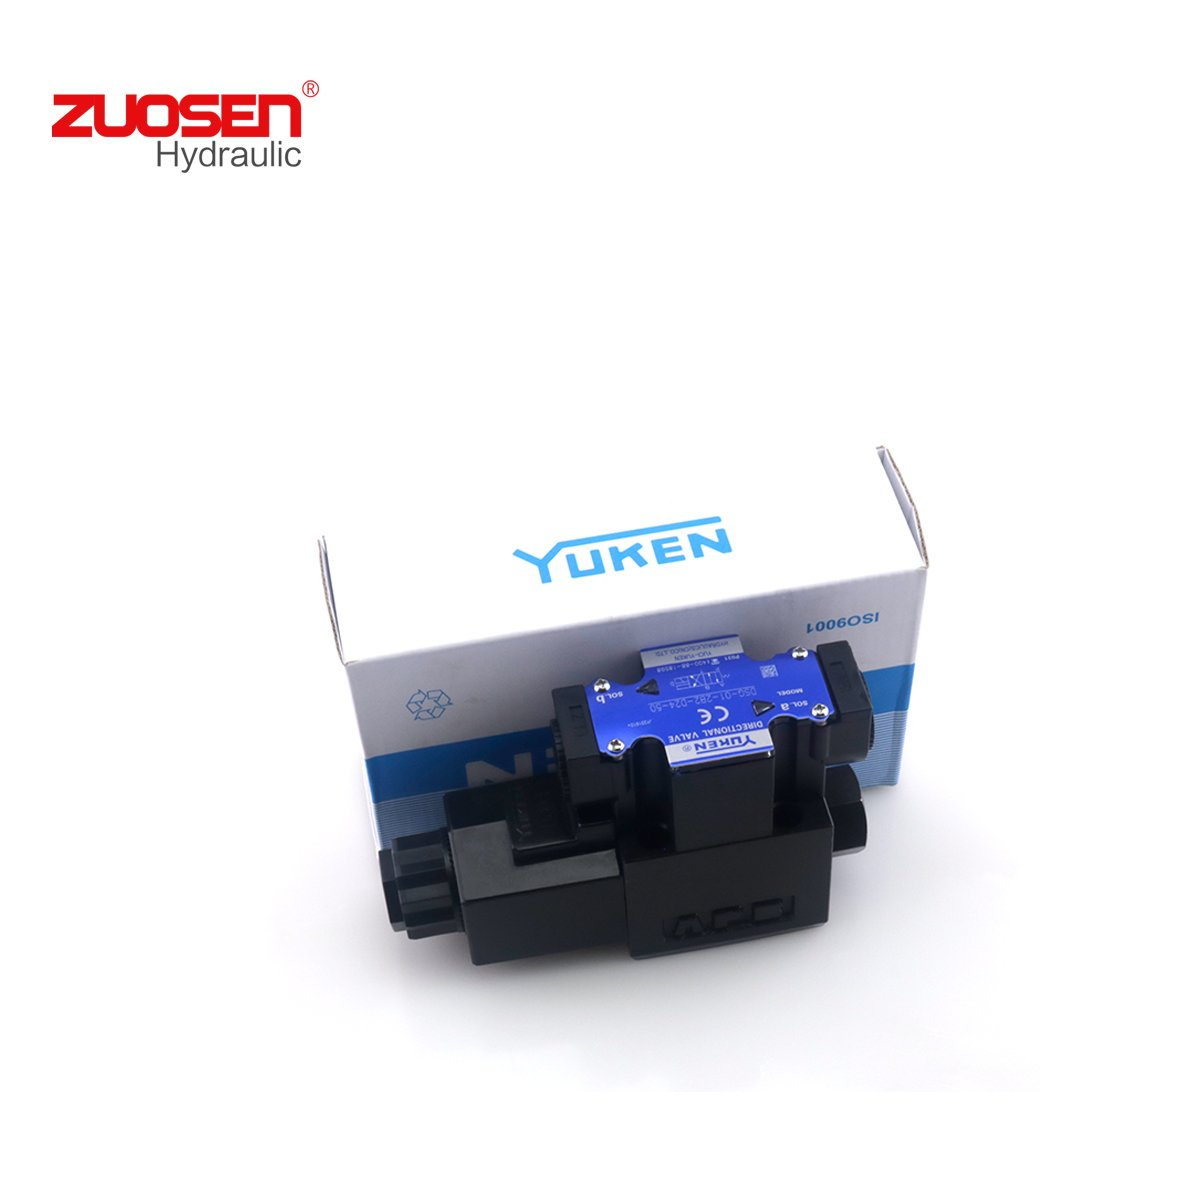 Yuken DSG-01-2B2-D24-70 Hydraulic Valves